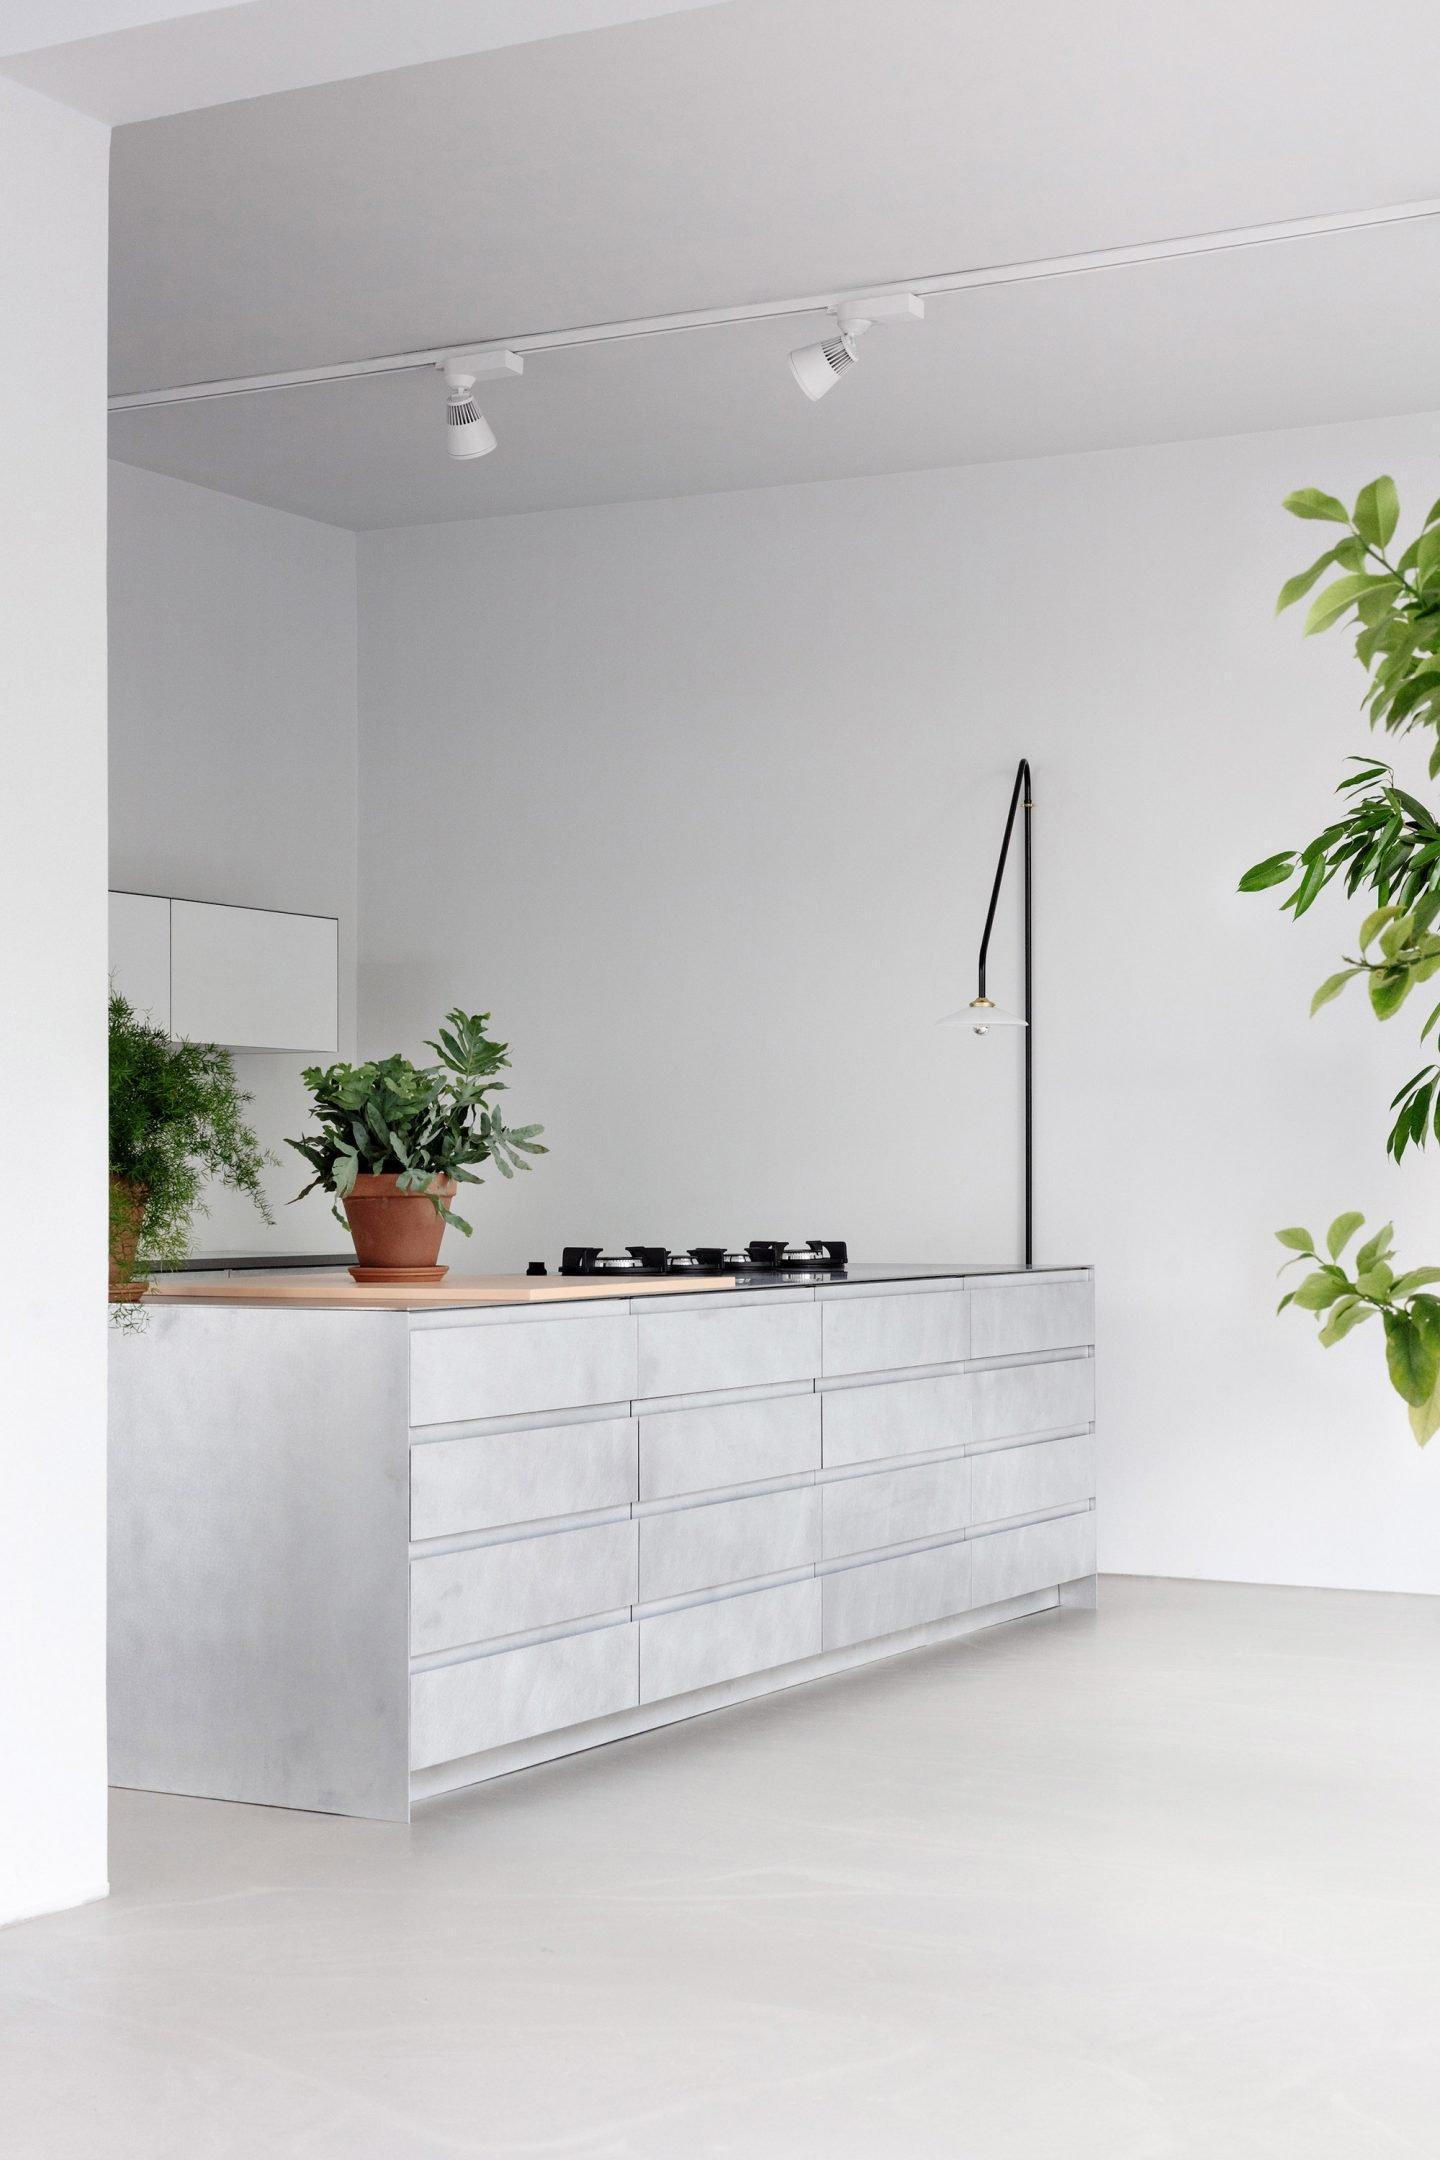 IGNANT-Design-Reform-PLATE-DavidThulstrup-07